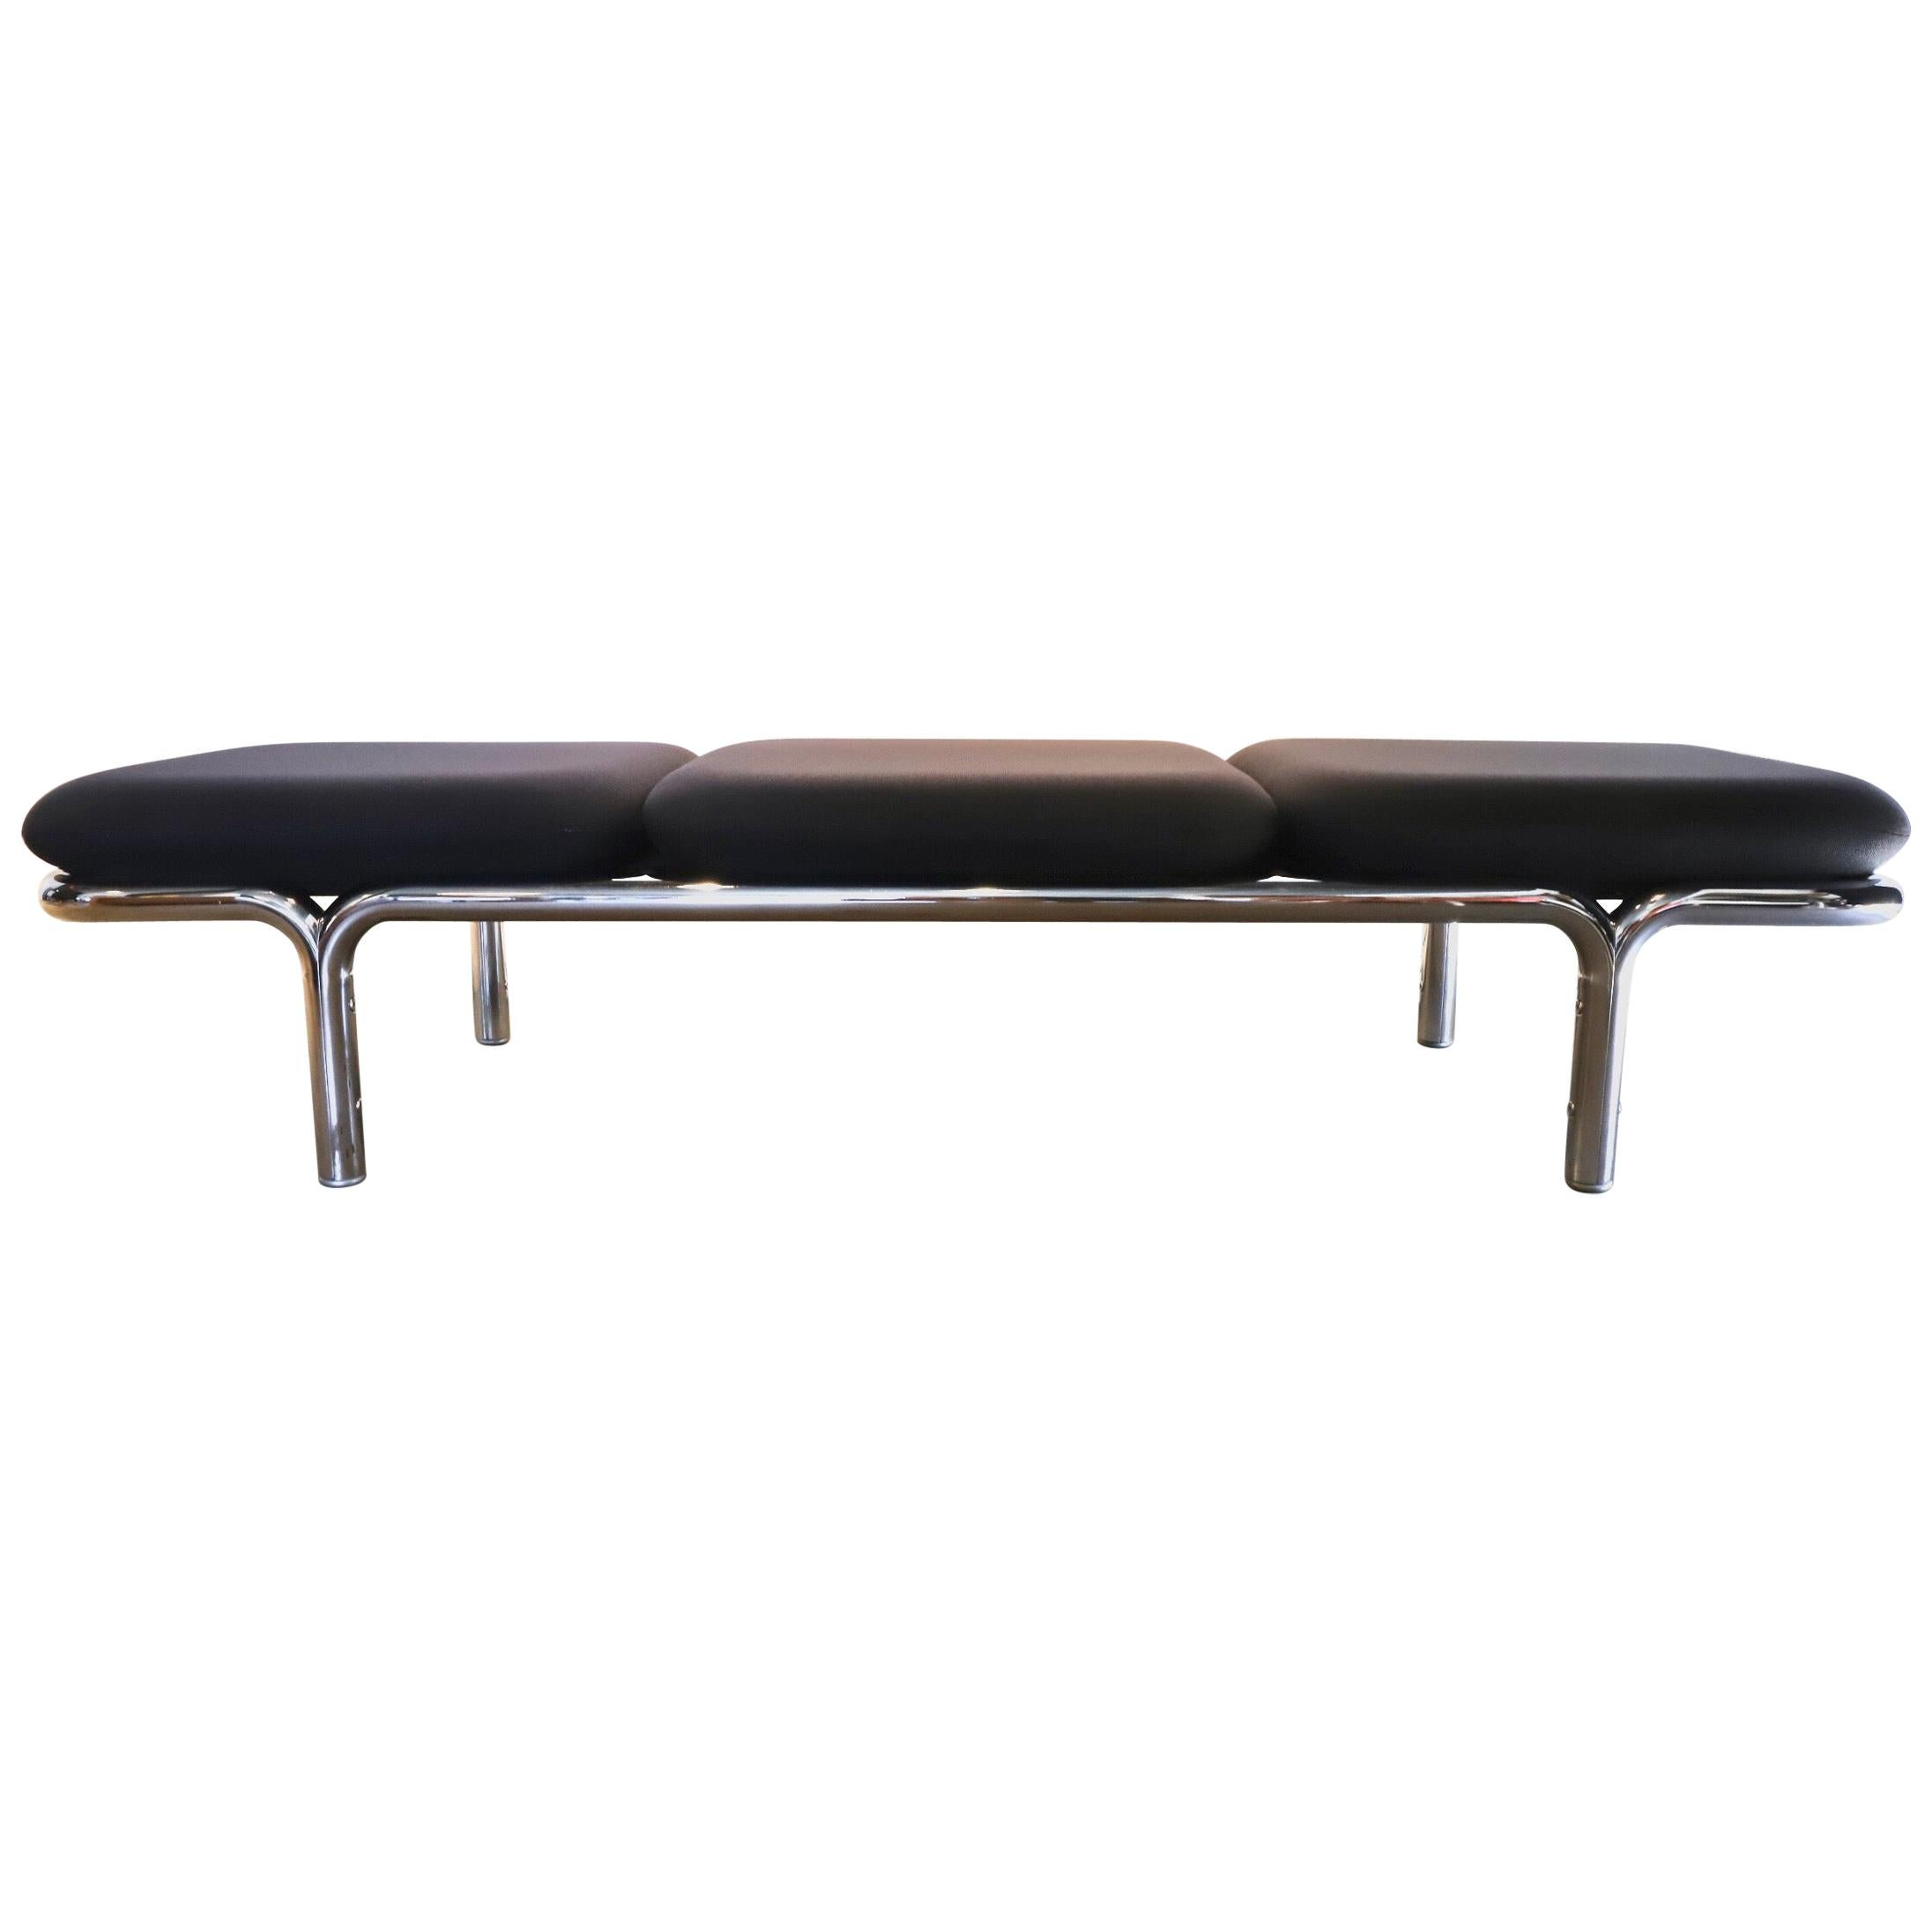 Chrome Museum Bench by Brian Kane for Metropolitan Furniture